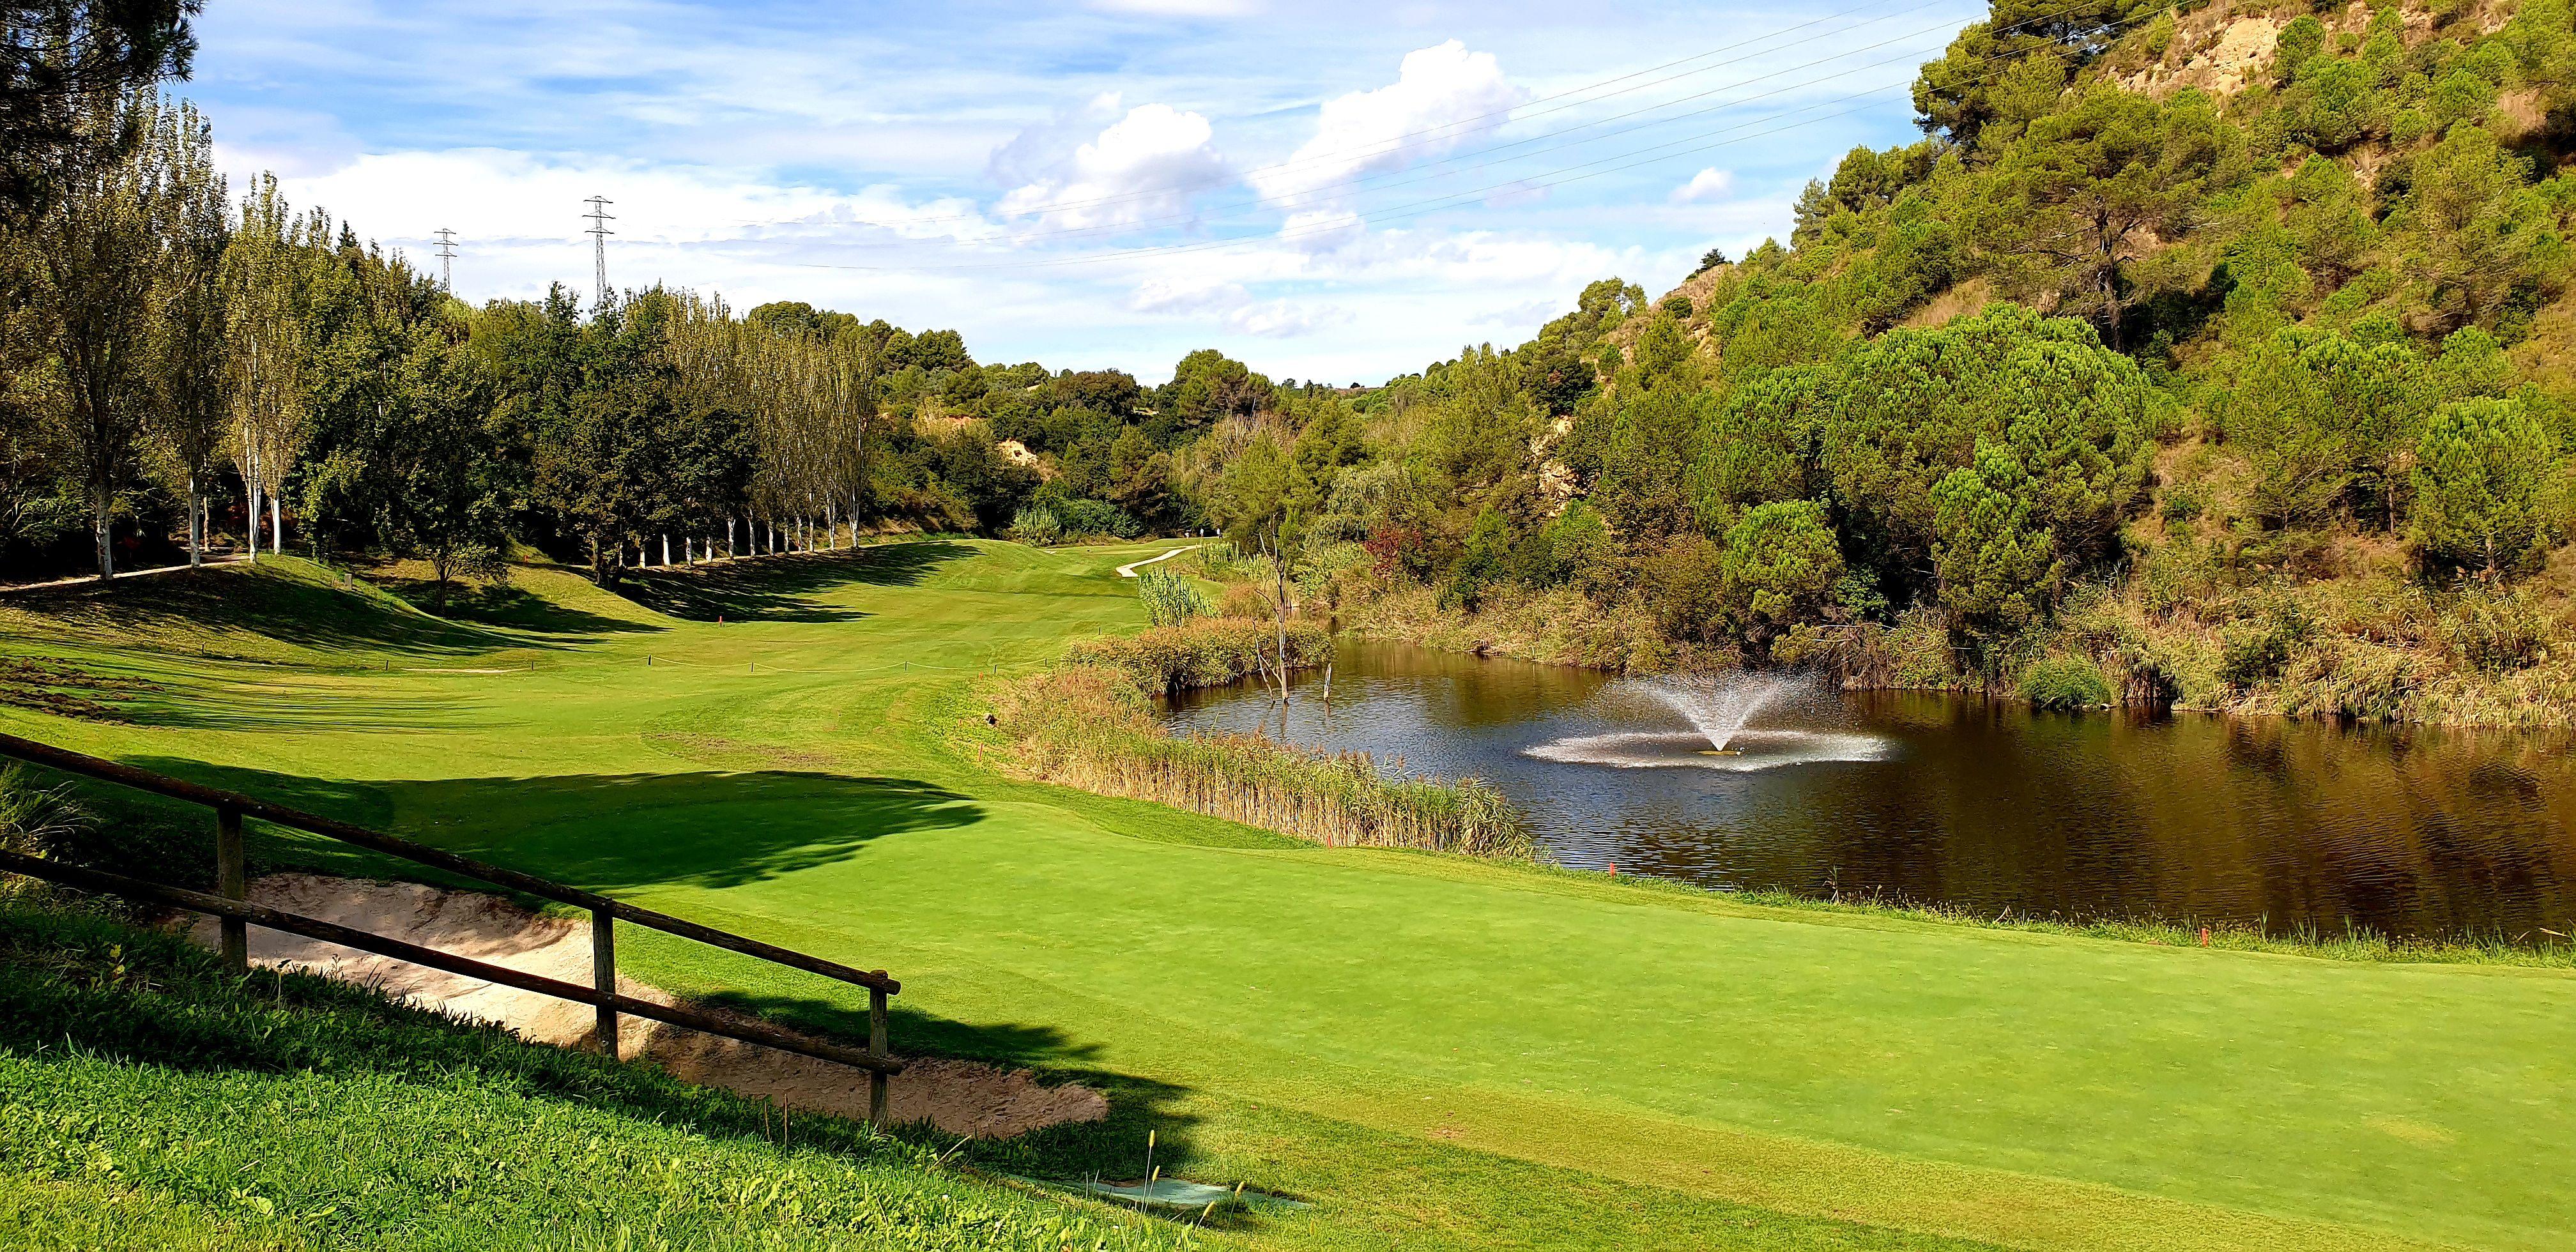 barcelona-golf-course